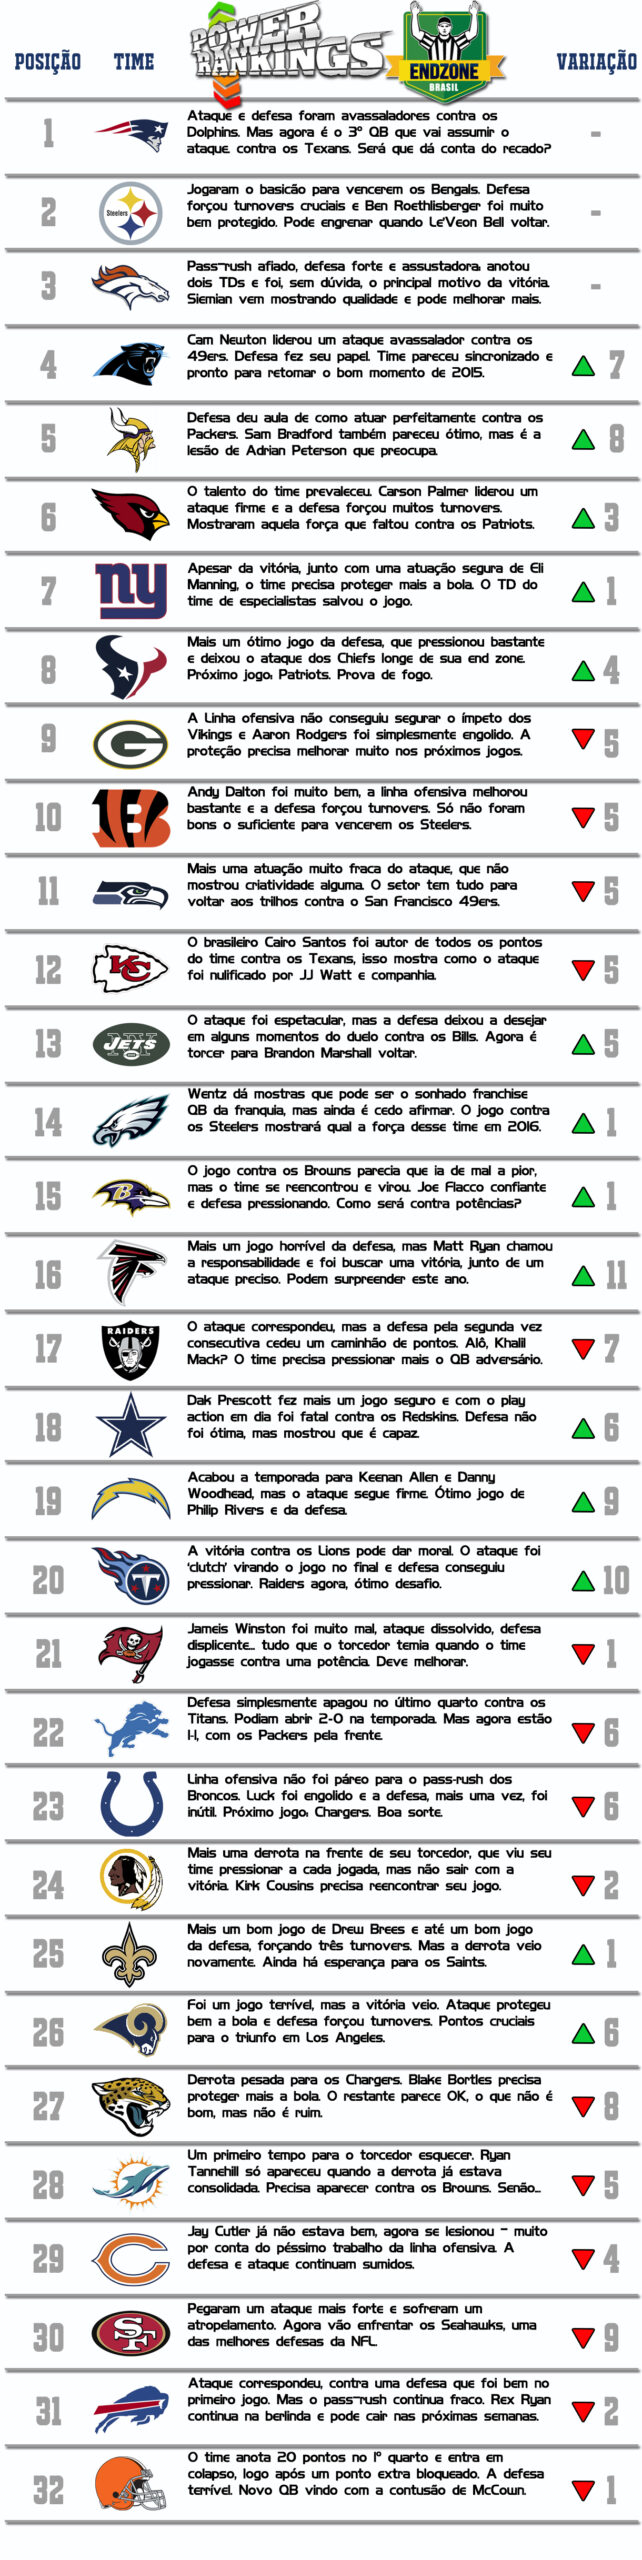 power-ranking-semana-2-2016